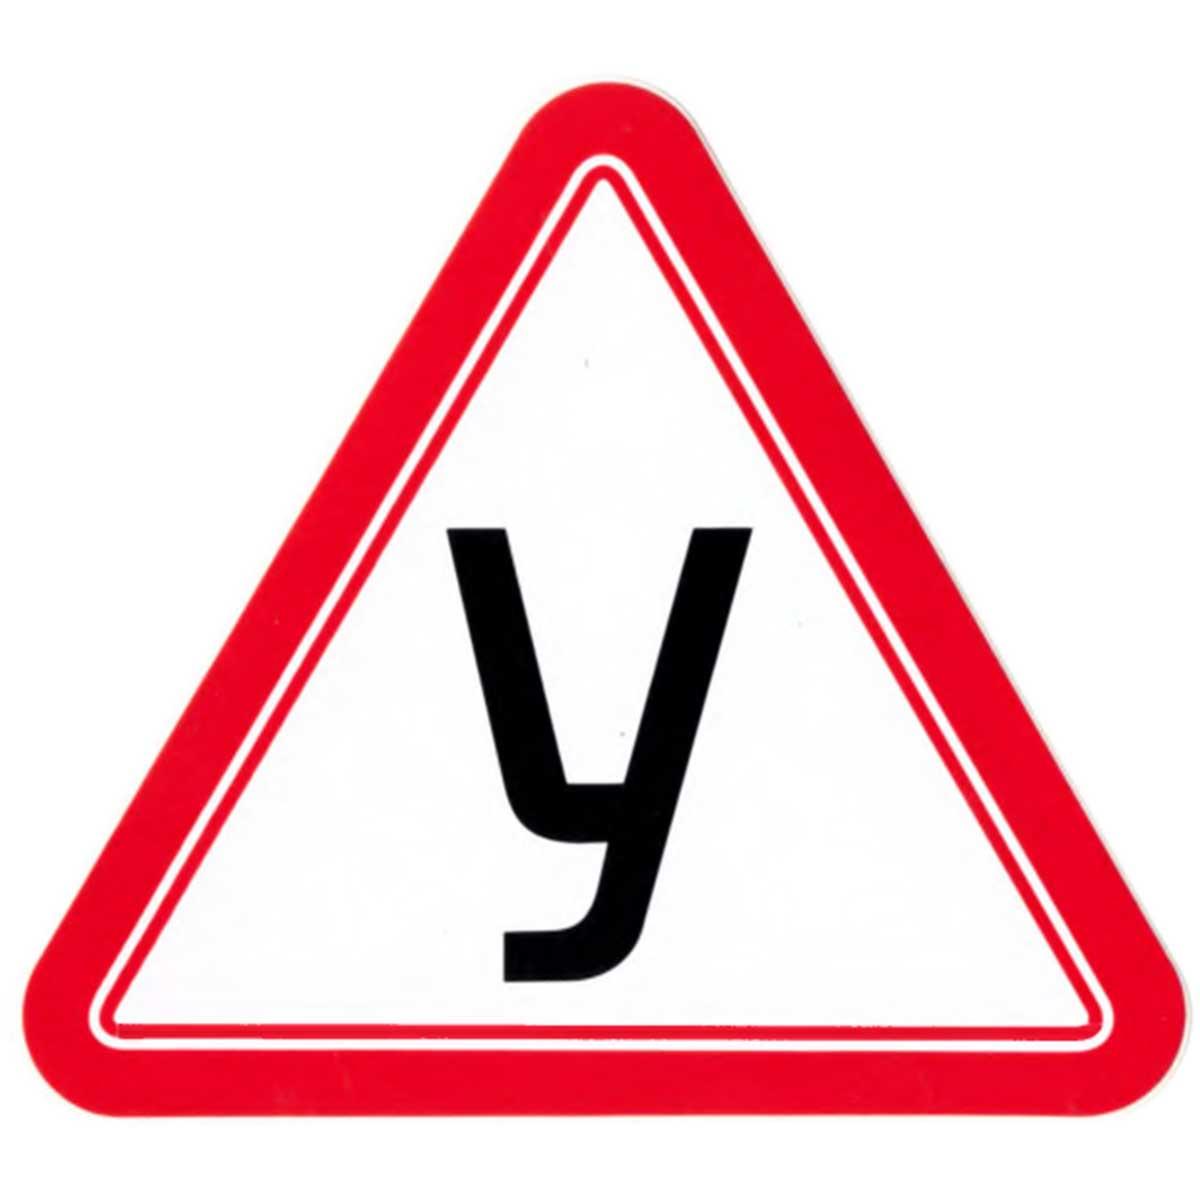 Фото - Наклейка на автомобиль Знак У виниловая 15х15 наклейка инвалид в авто двухсторонняя 15х15 см